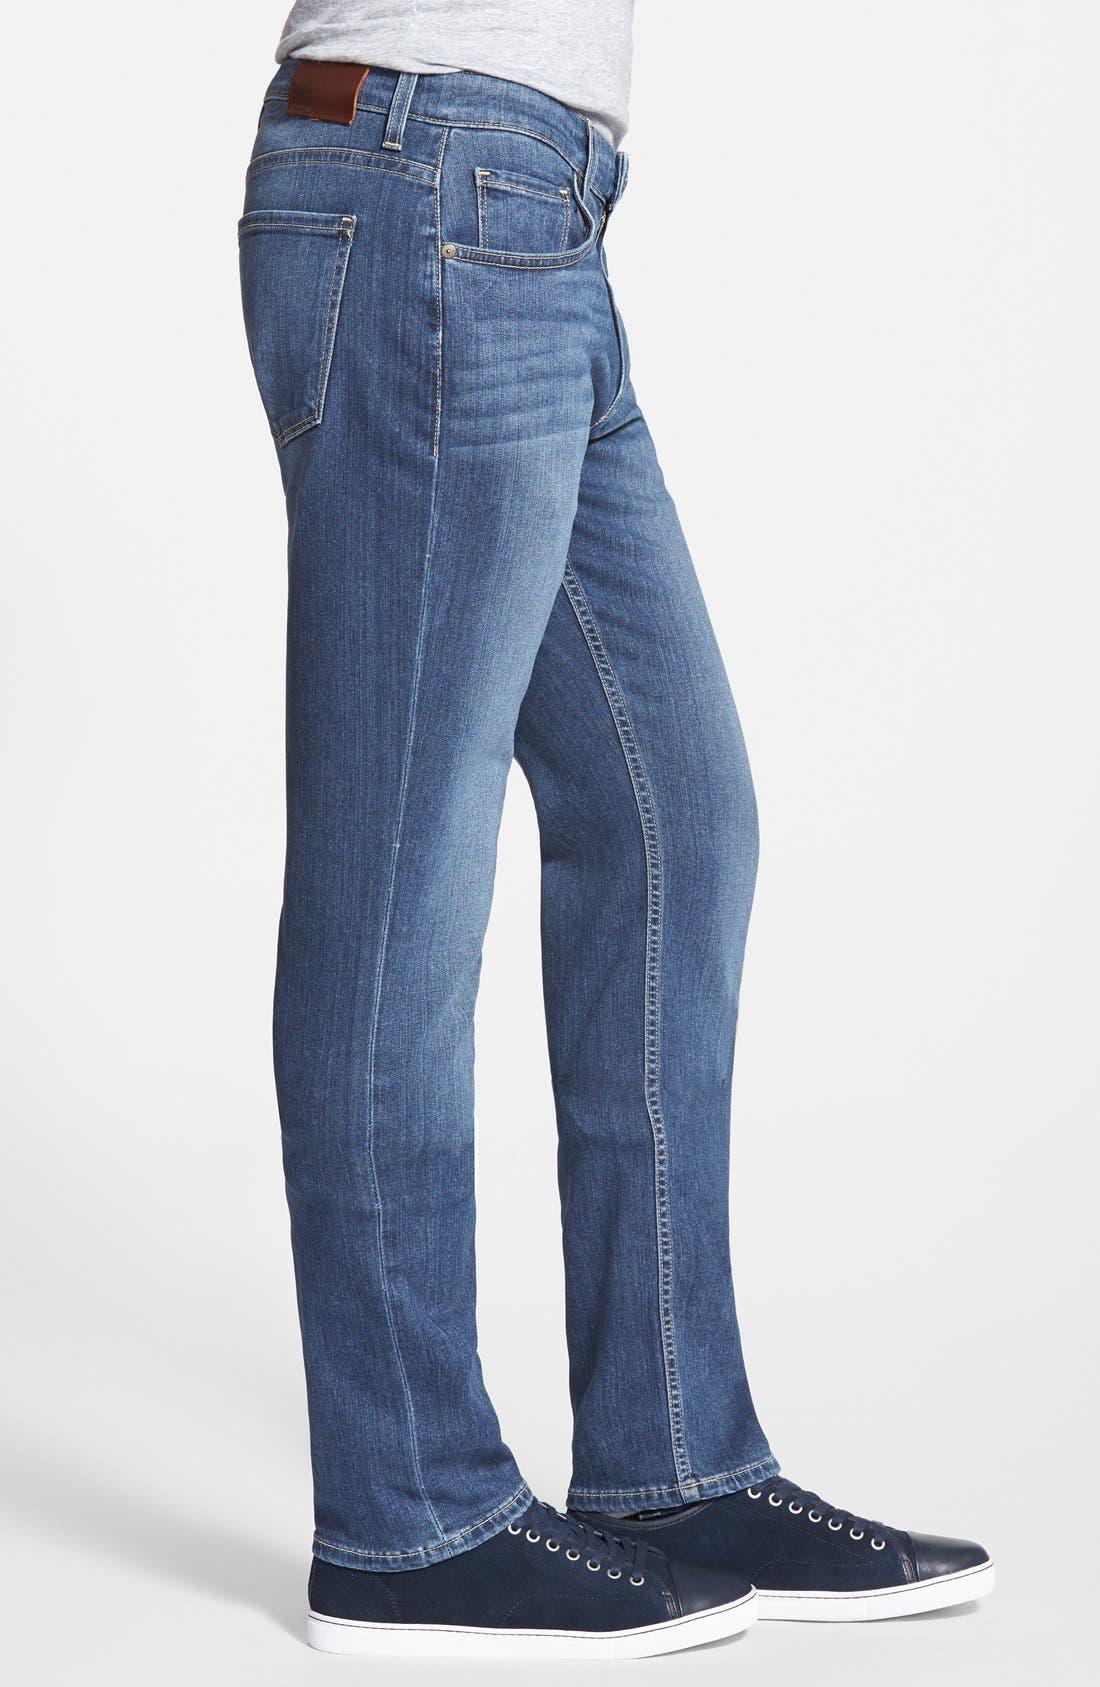 PAIGE, Transcend - Federal Slim Straight Leg Jeans, Alternate thumbnail 10, color, BIRCH